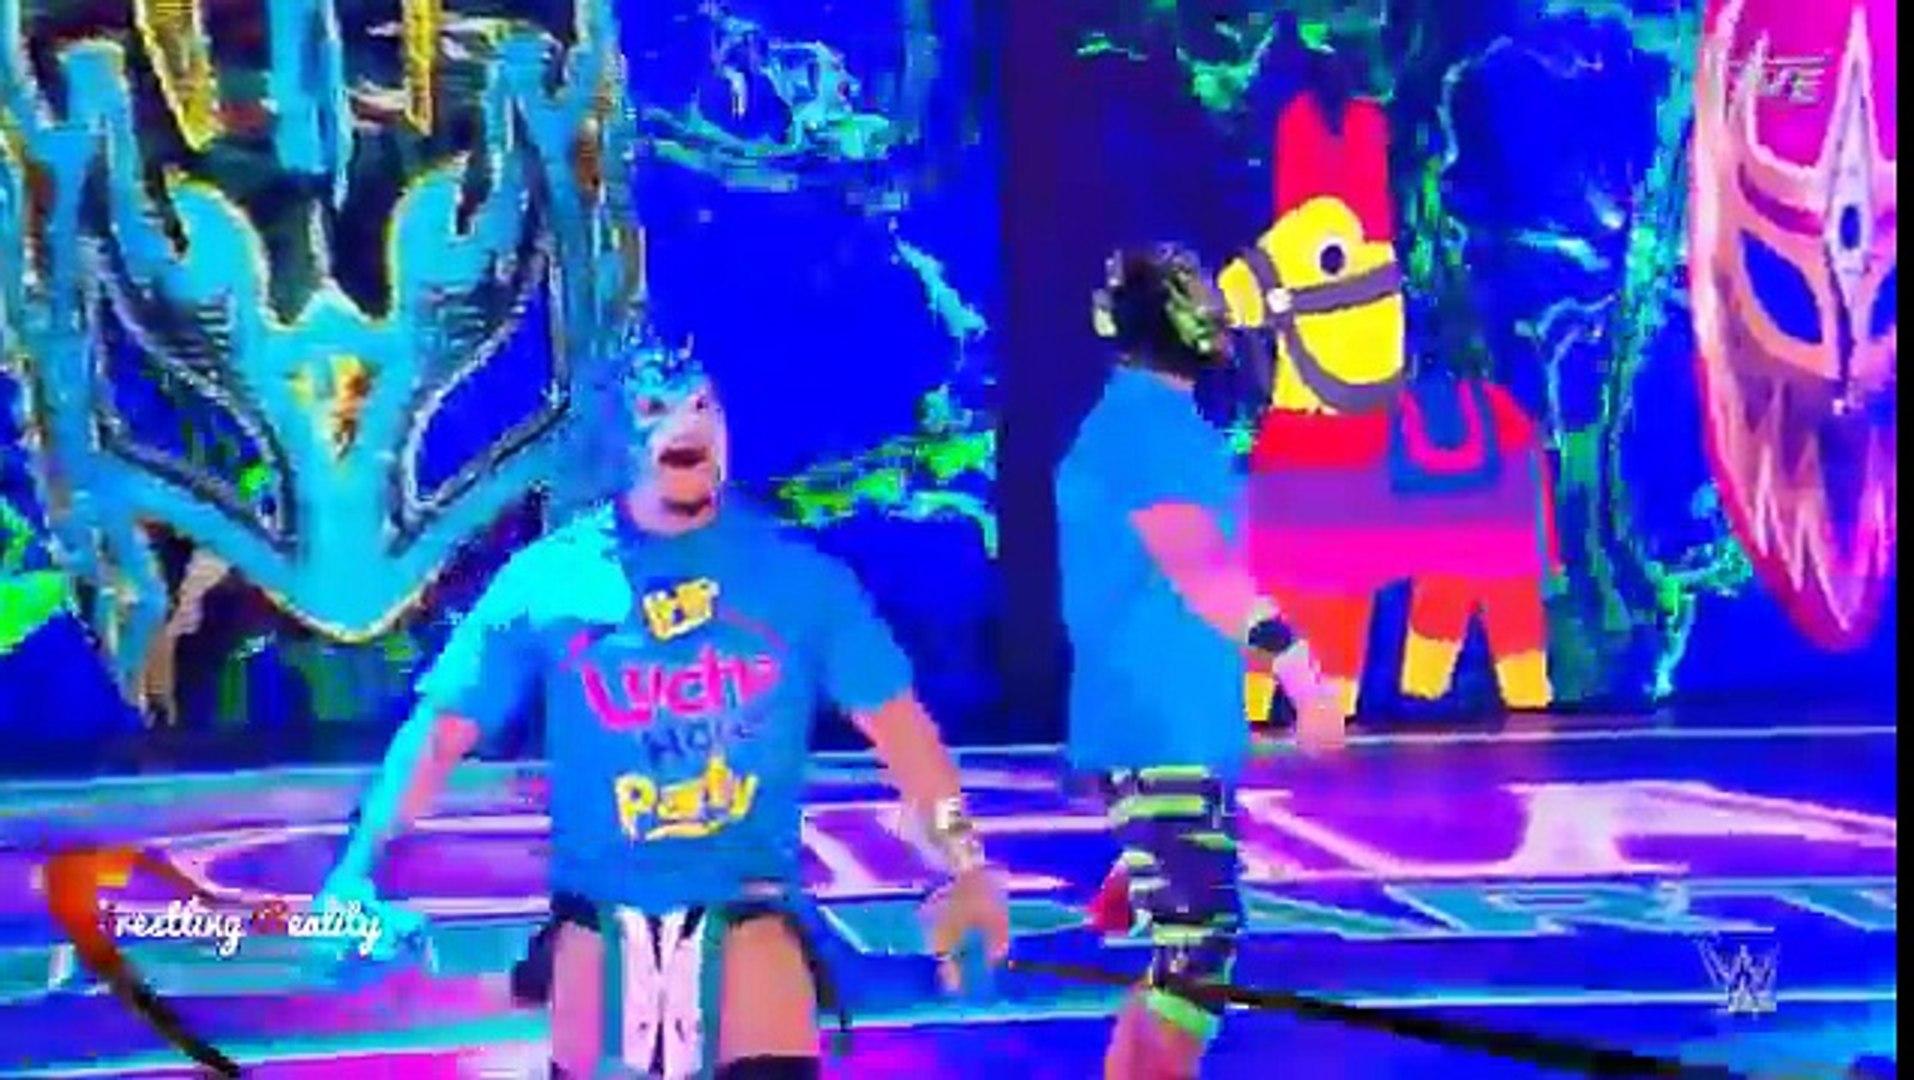 WWE 205 Live 24th July 2018 Highlights HD - WWE 205 Live 7-24-2018 Highlights HD